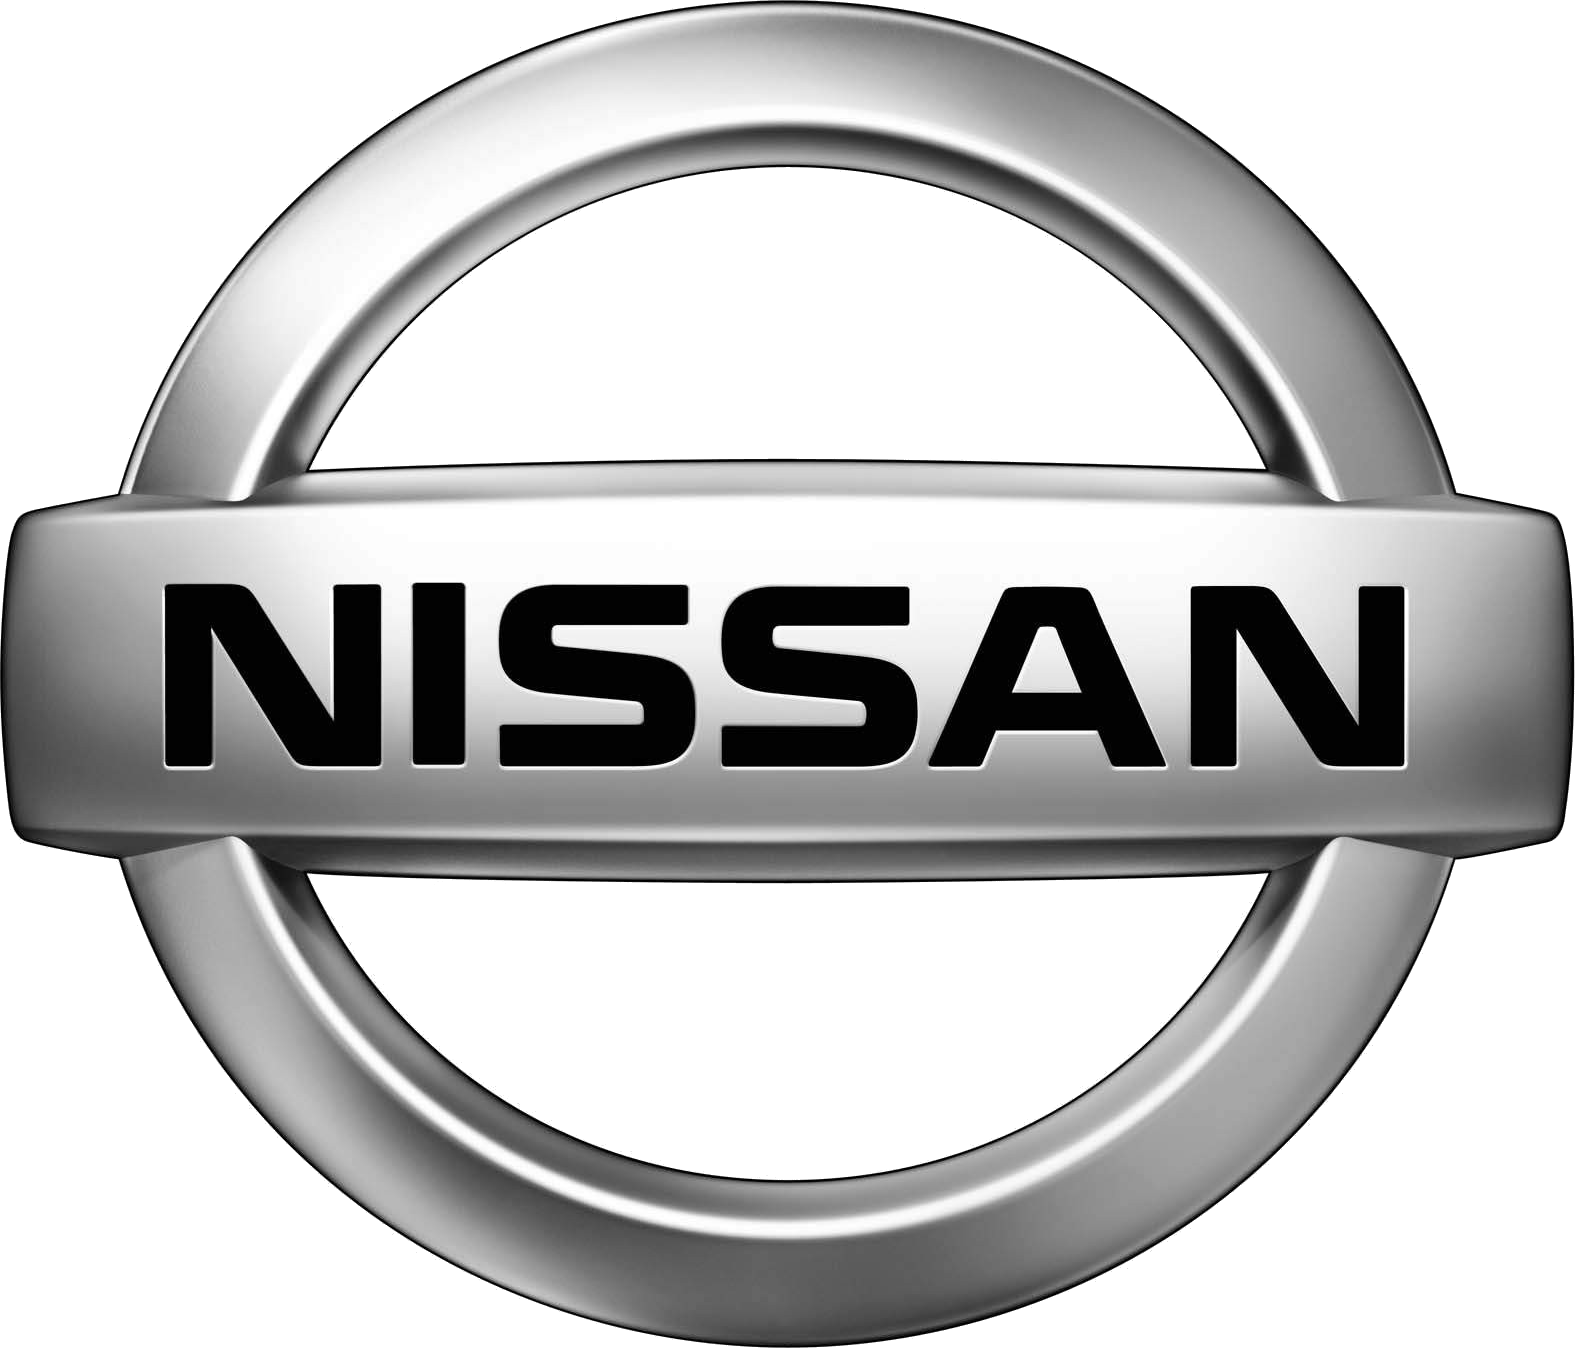 nissan_logo-2